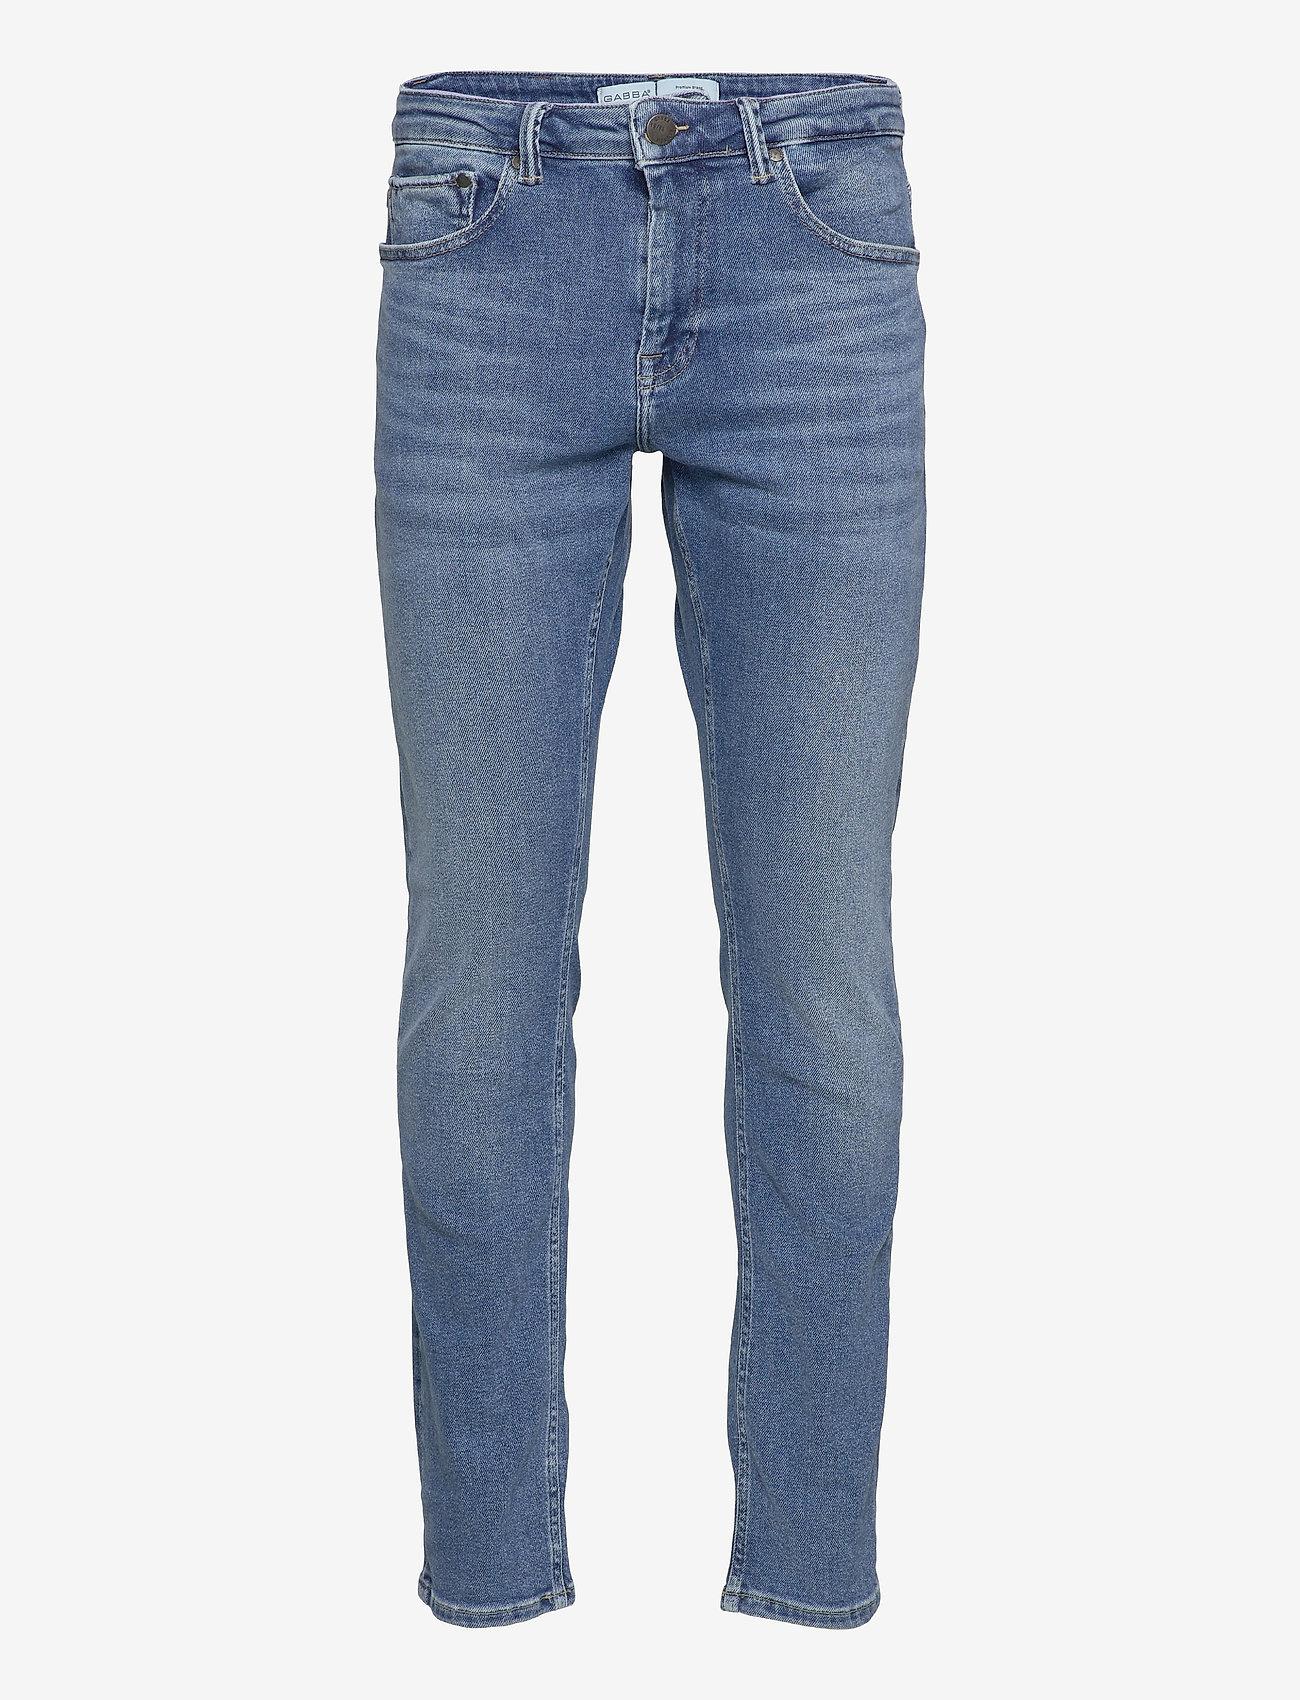 Gabba - Jones K3826 Jeans - slim jeans - rs1346 - 0